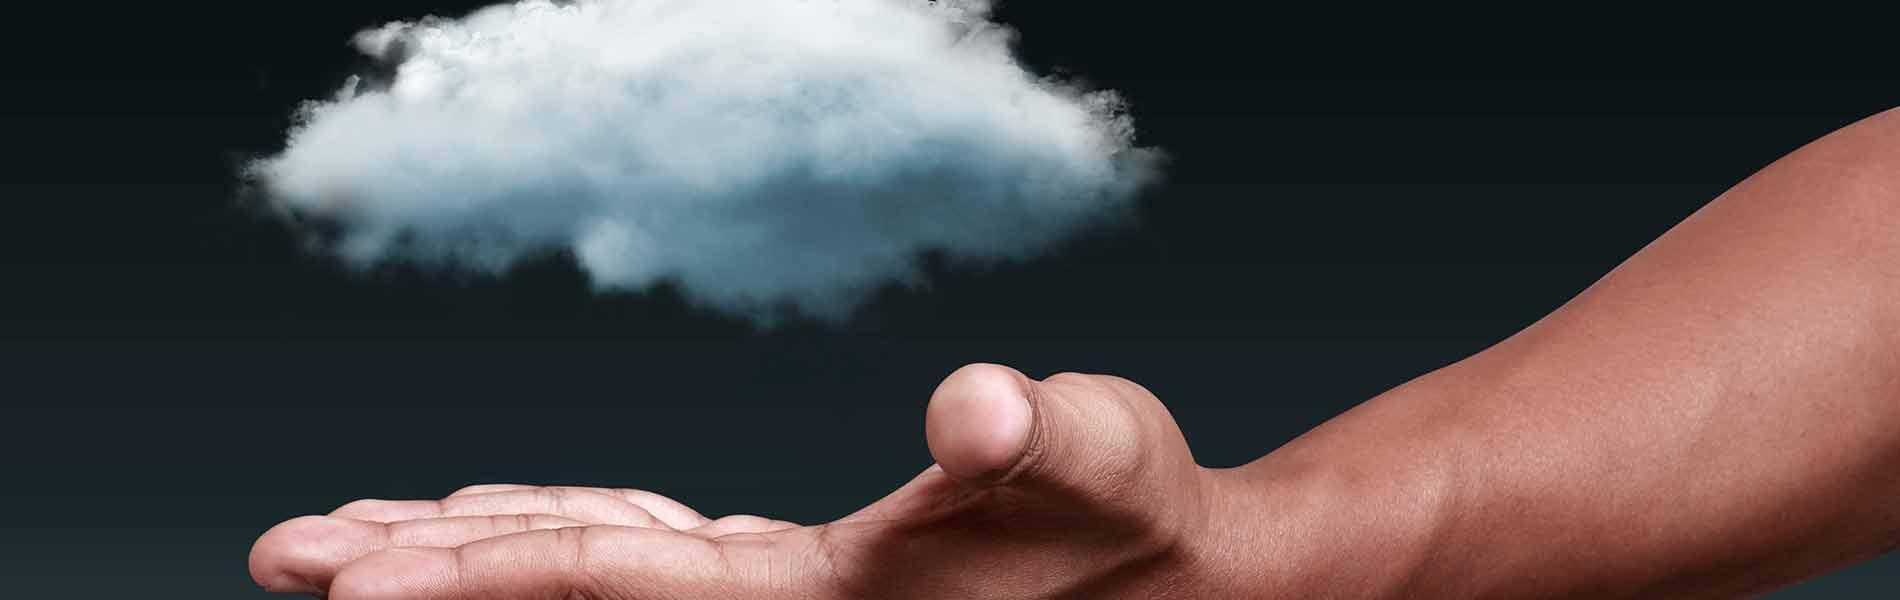 Azure, go cloud, ERP considerations, CRM considerations, Dynamics 365